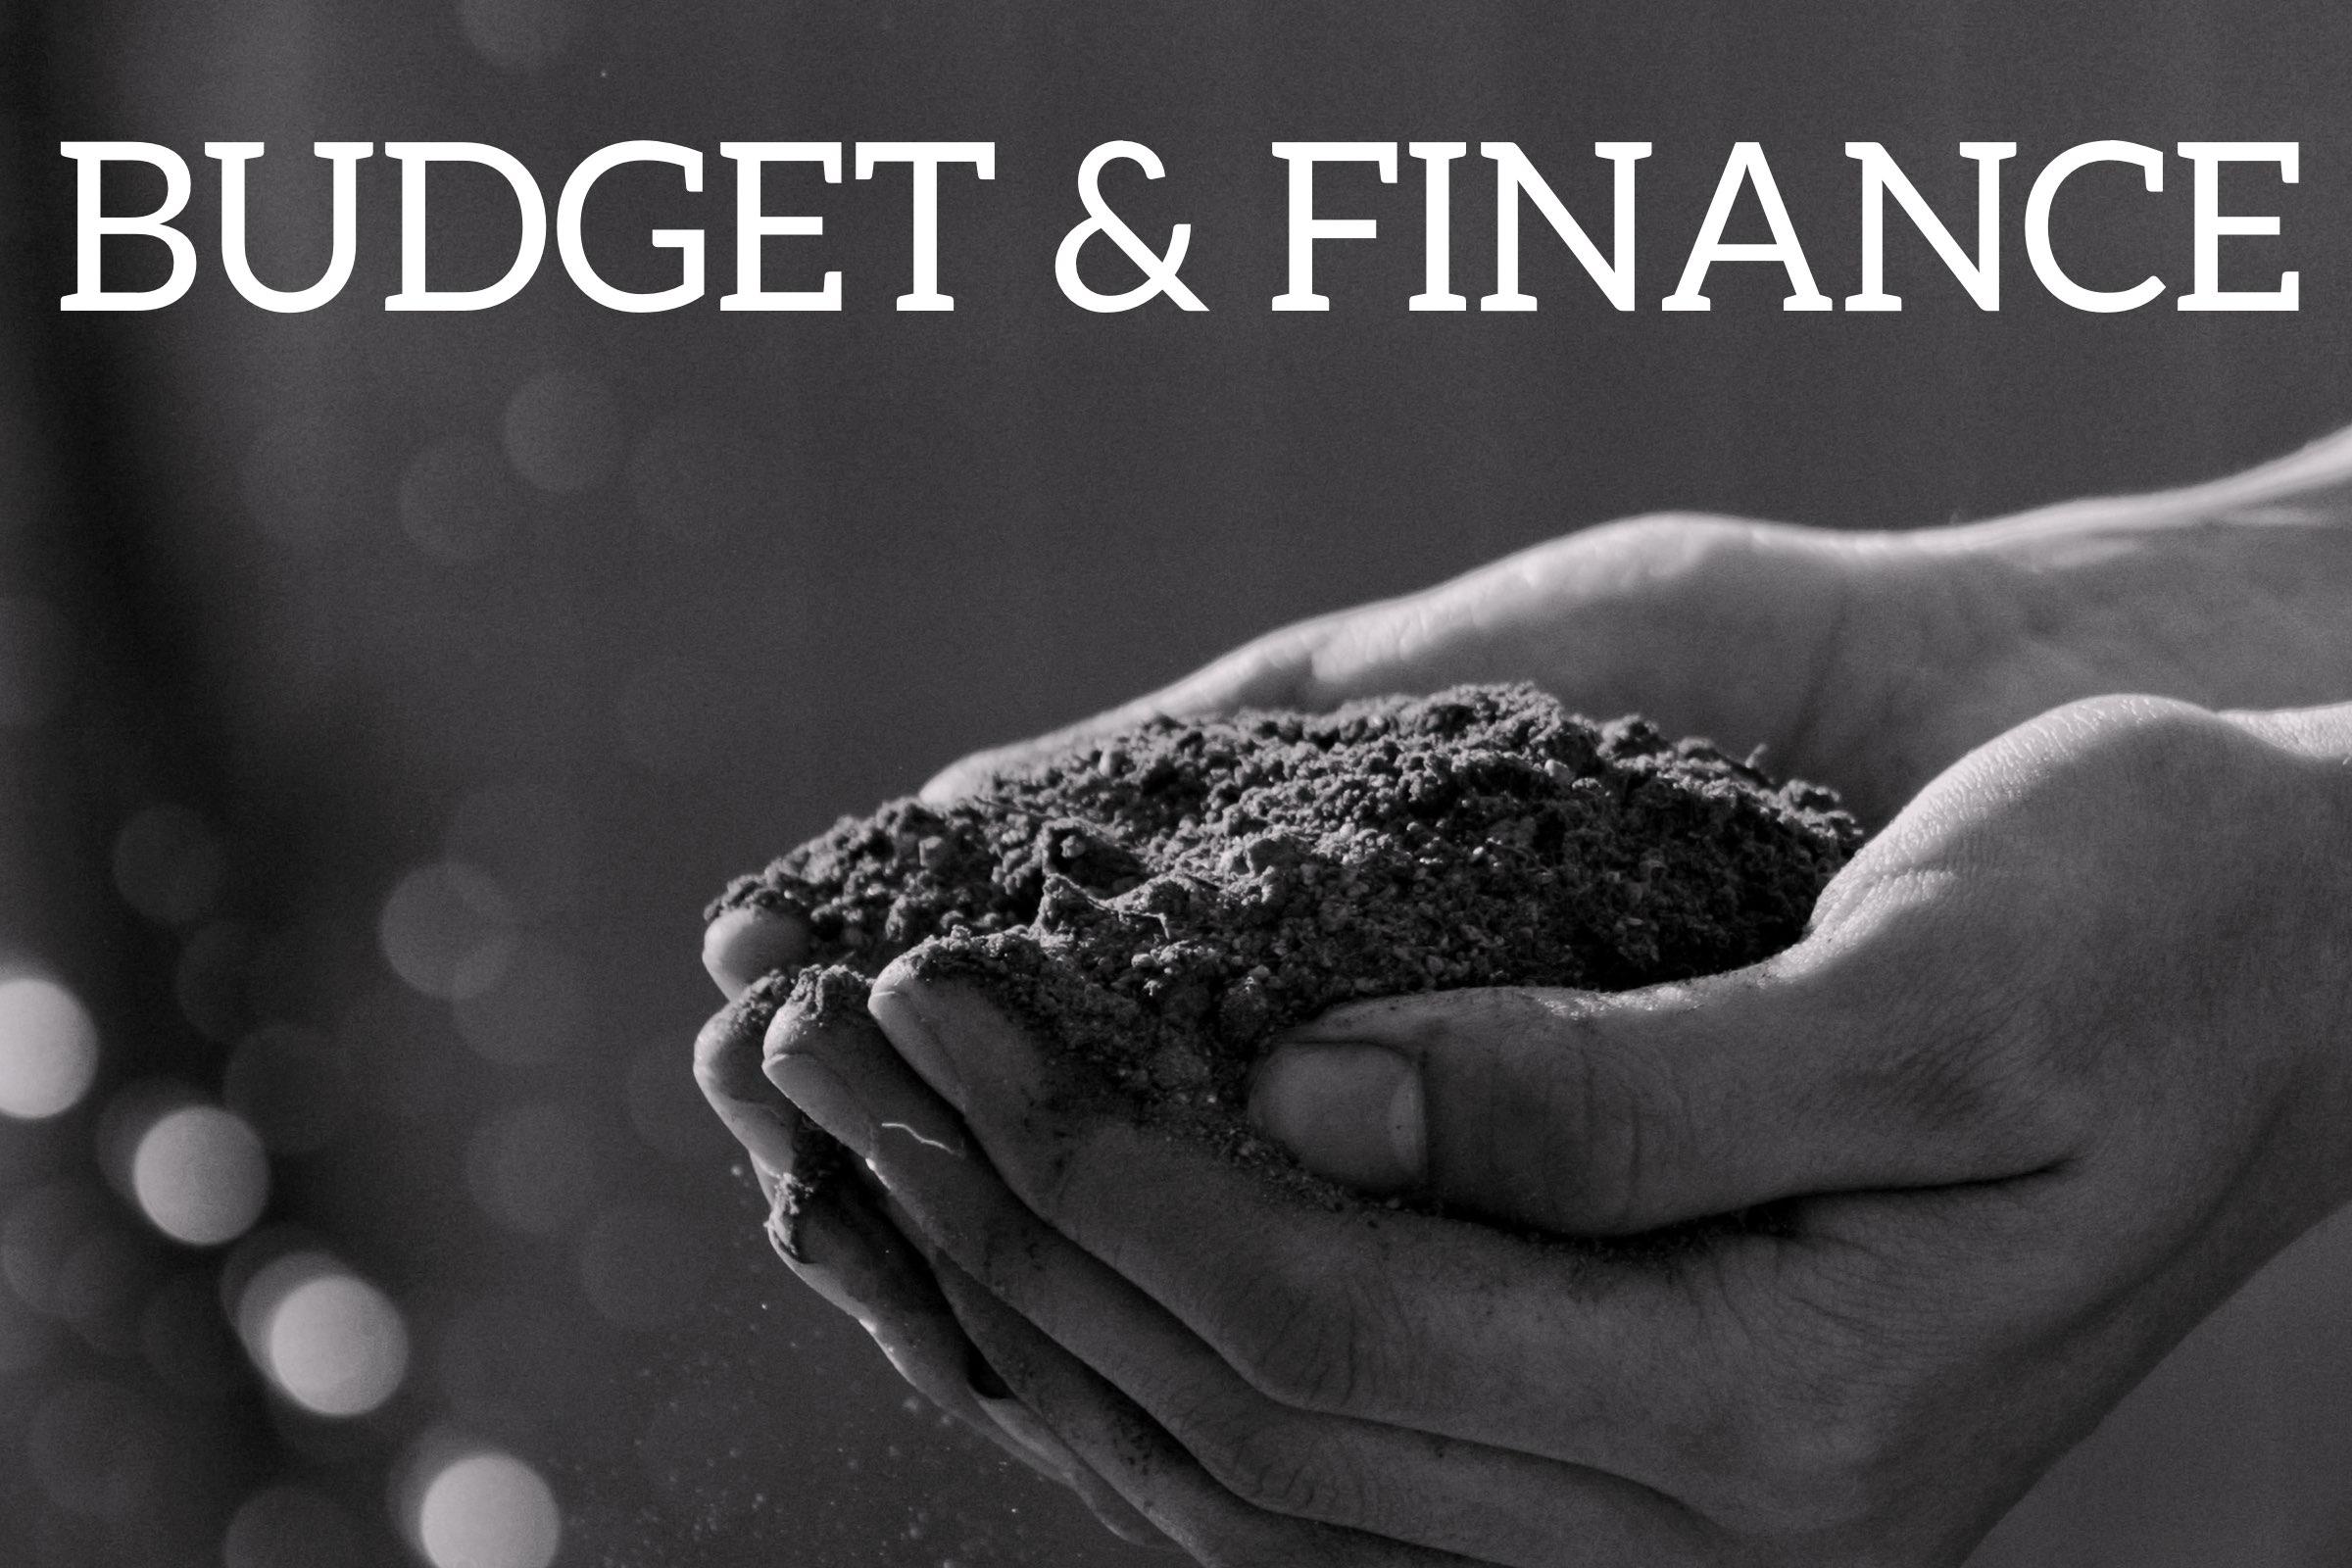 Budget and Finance Web_small.jpg